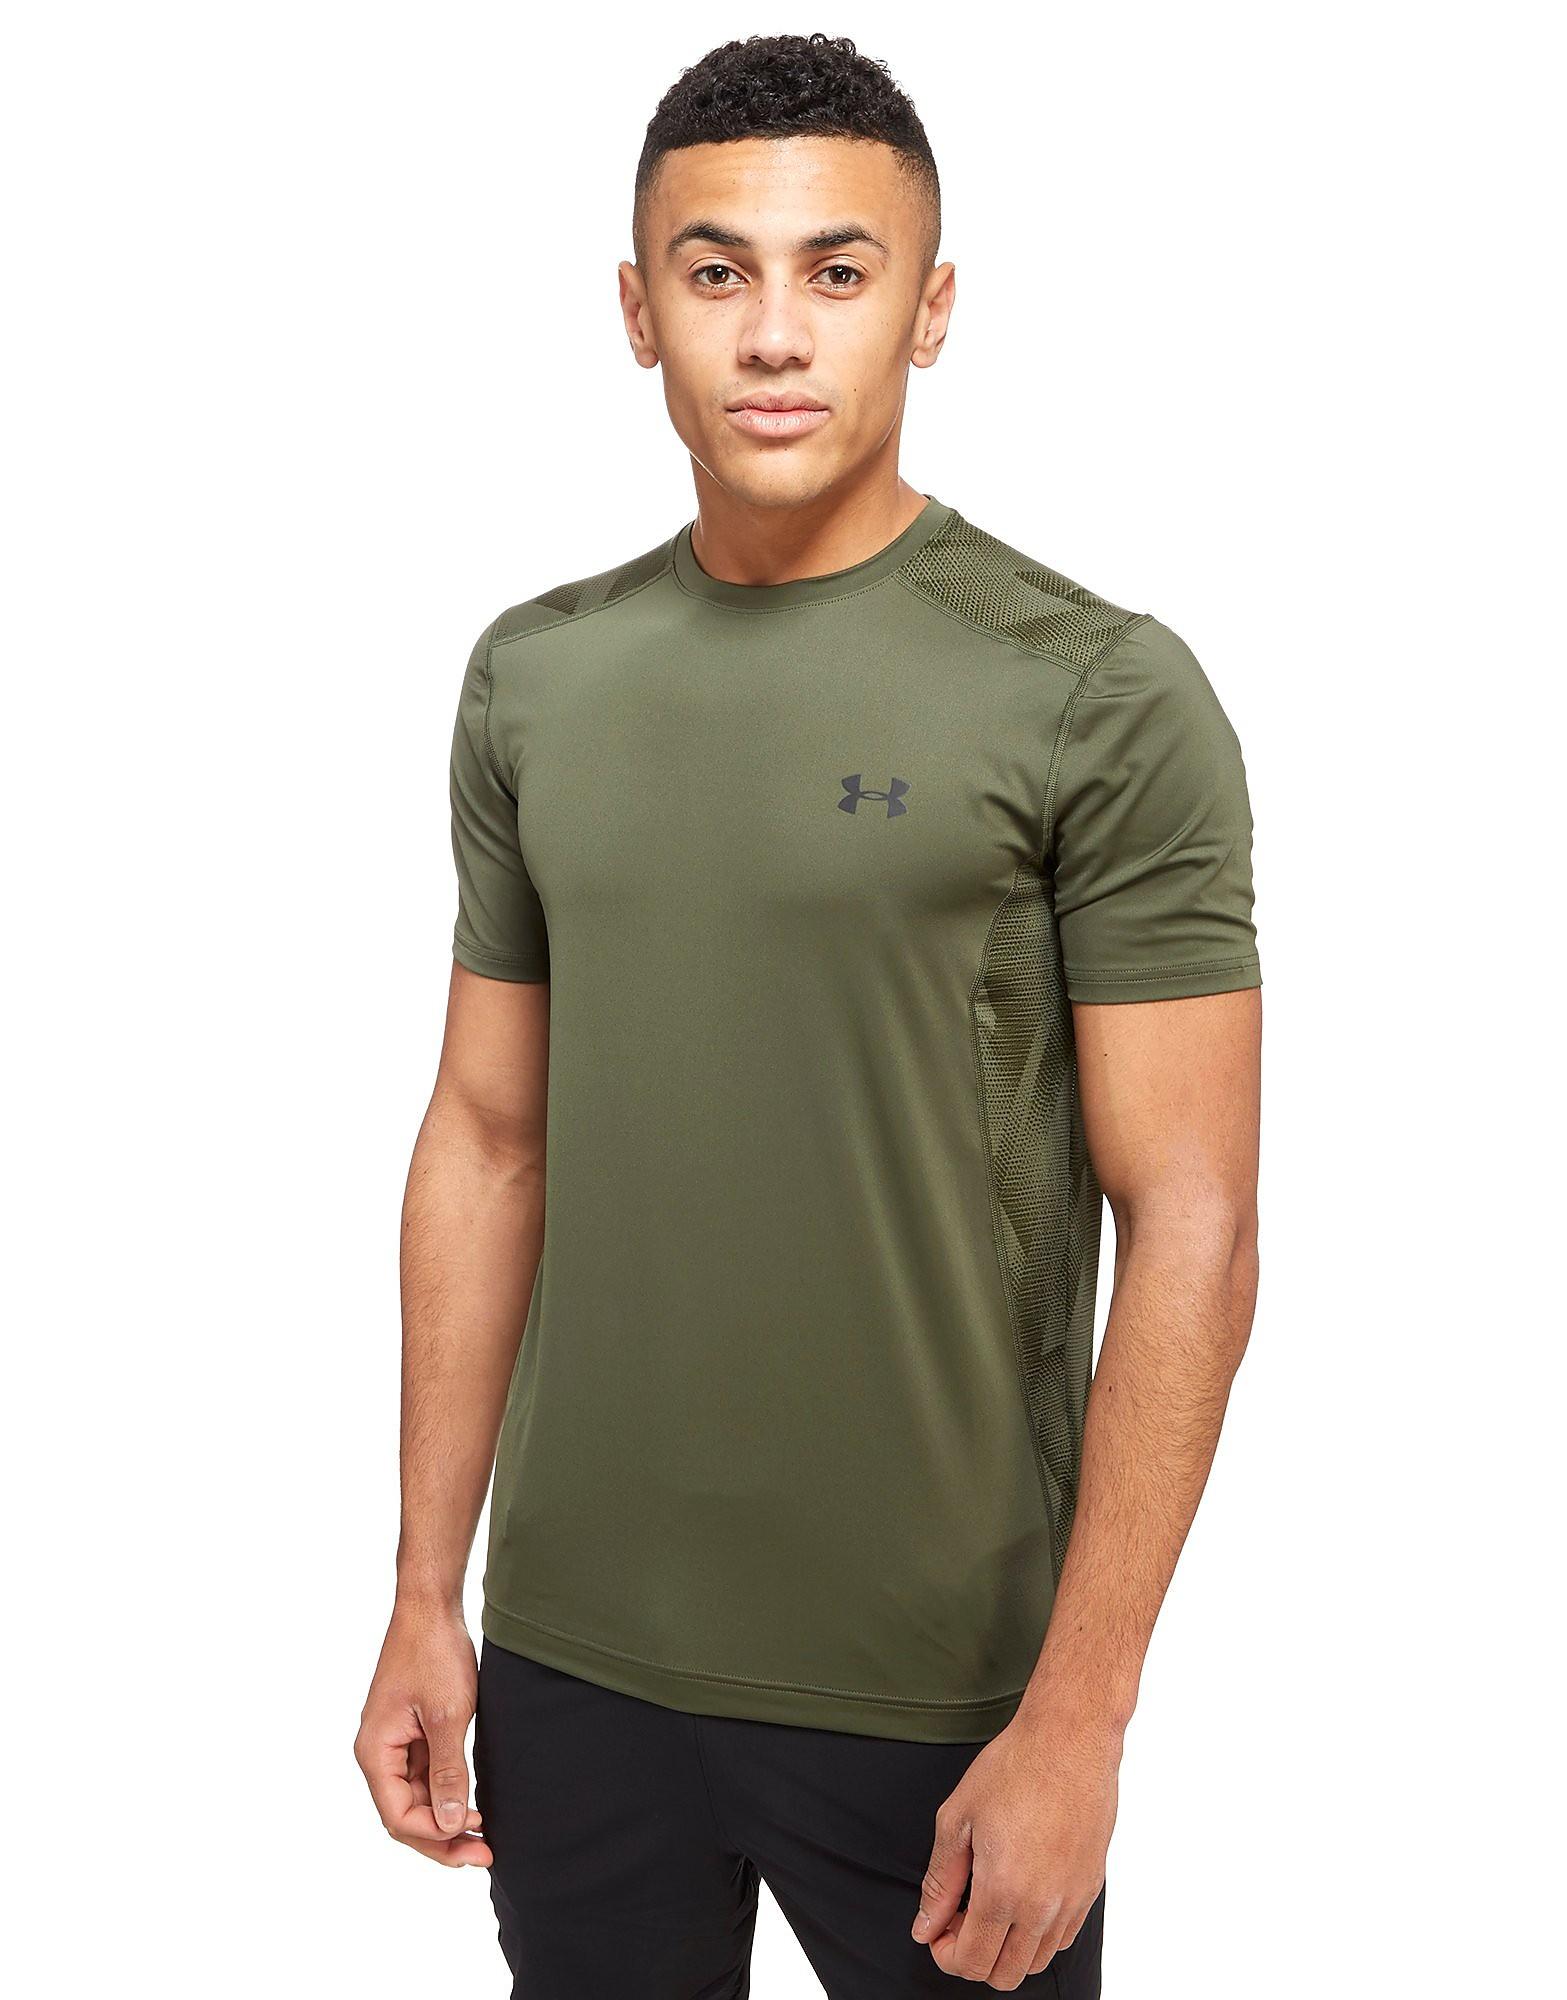 Under Armour Raid T-Shirt